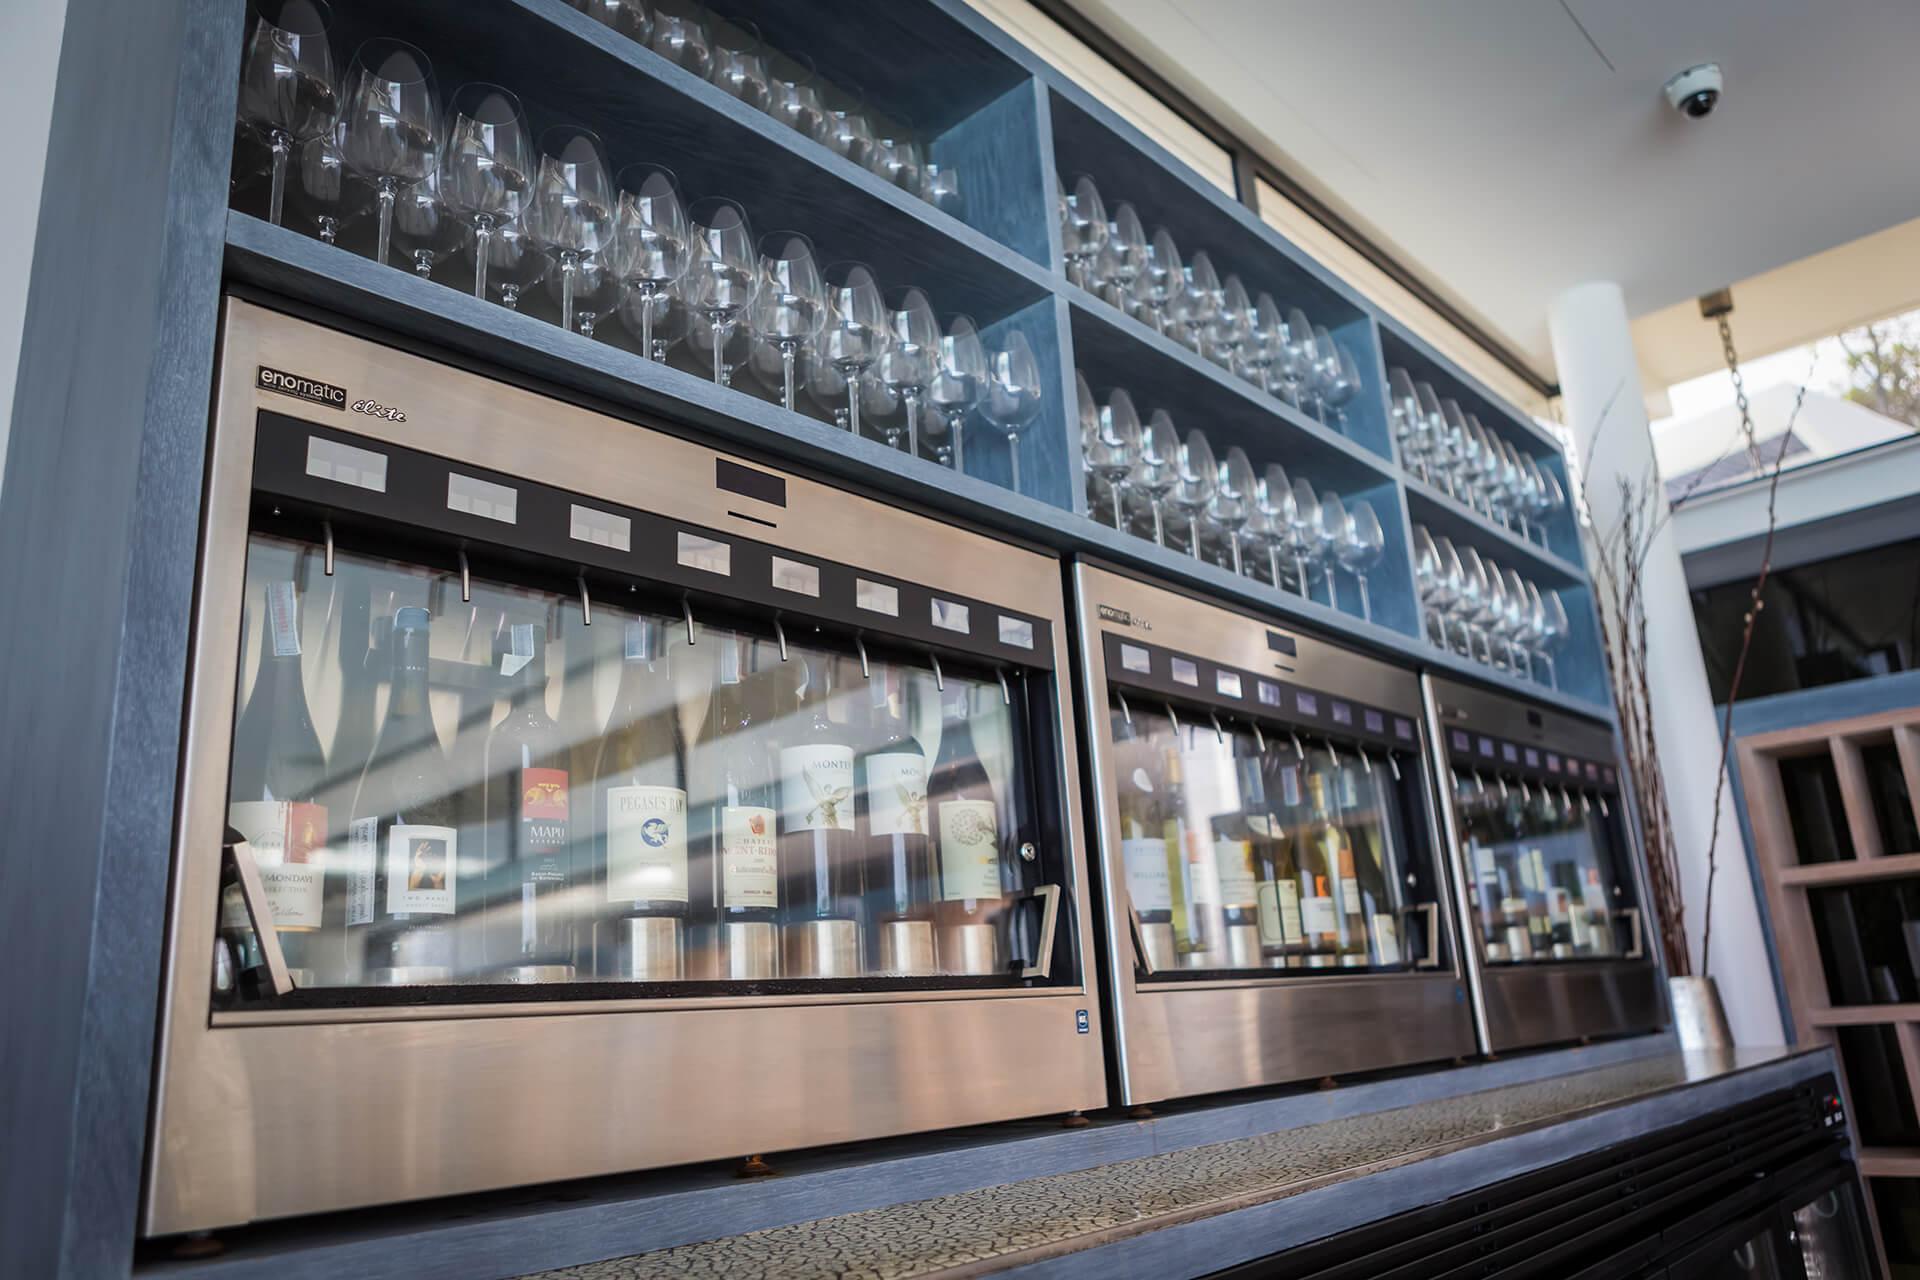 Wine Cellar - Enomatic Wine Machine